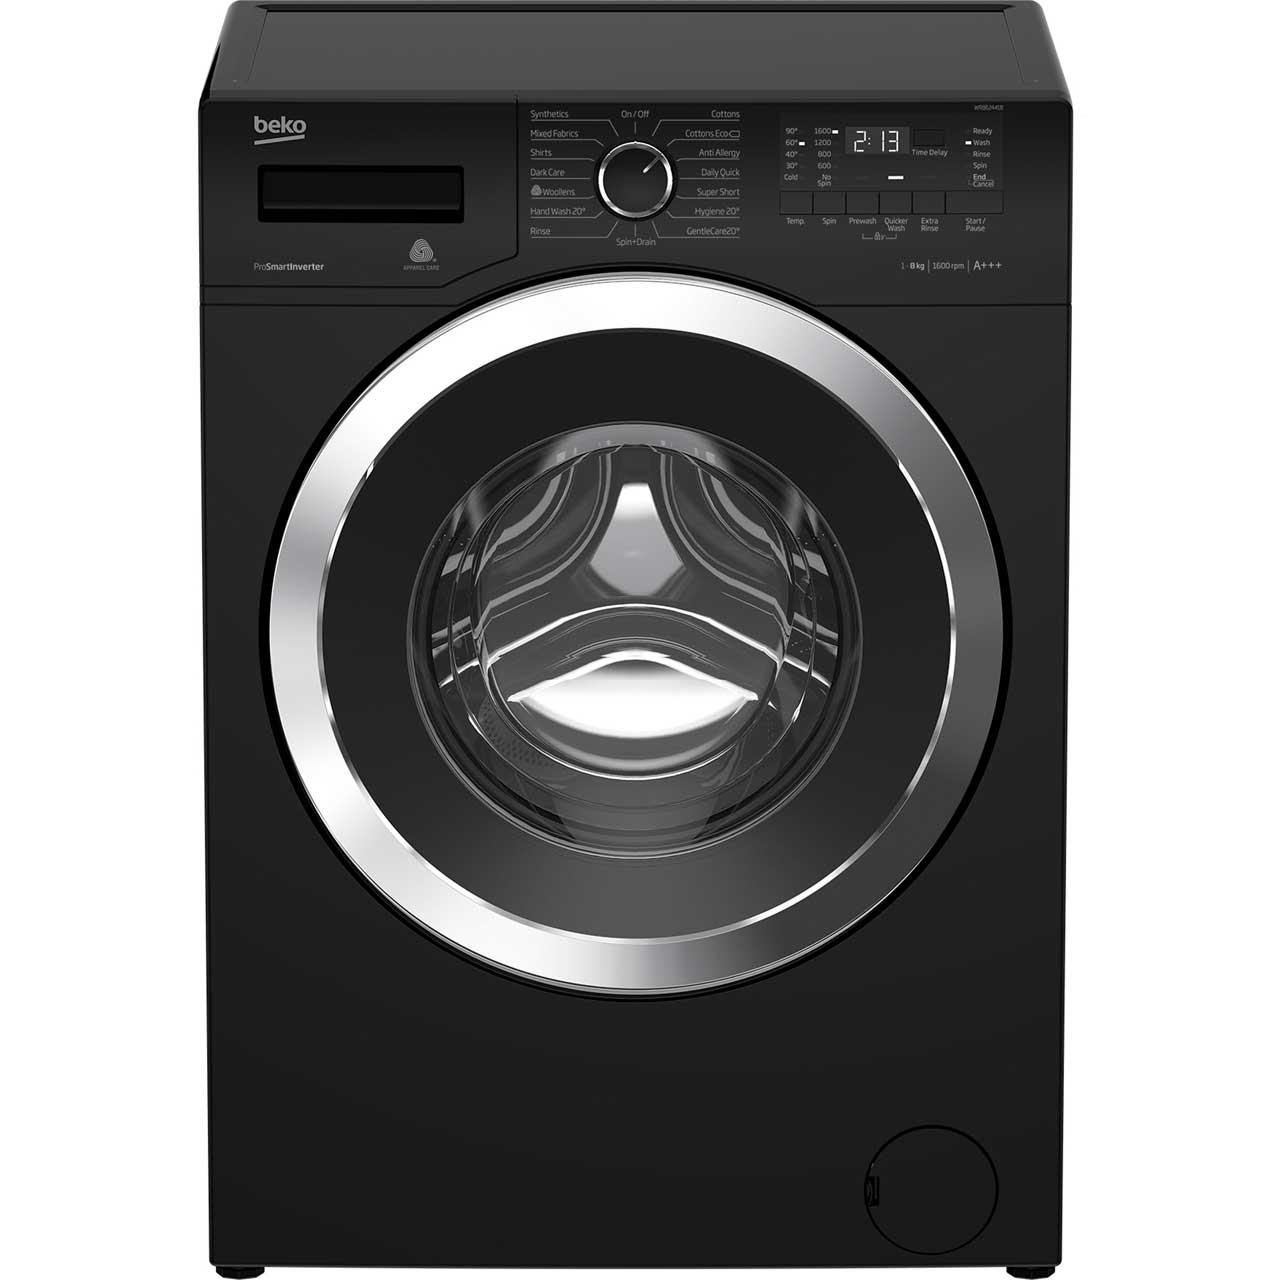 Beko WR862441B Free Standing Washing Machine in Black